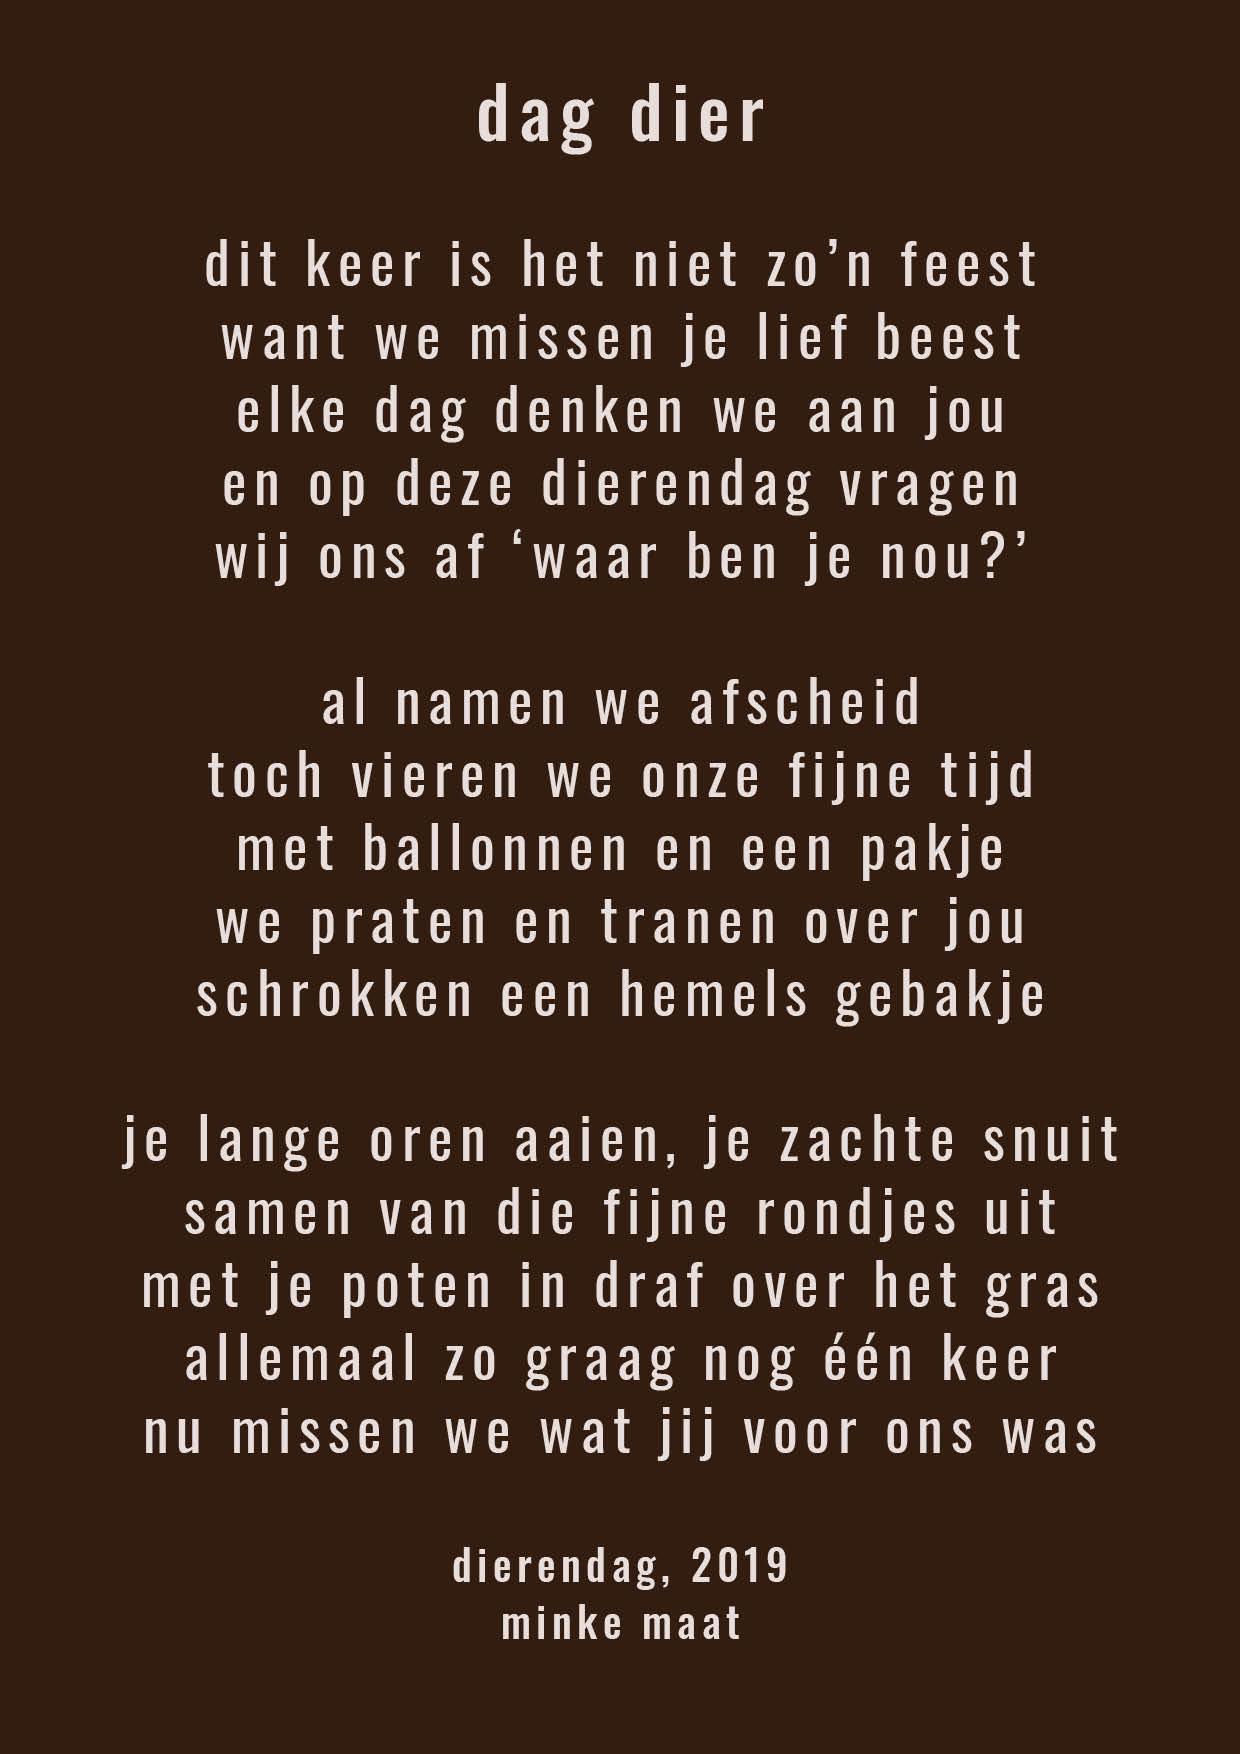 Gedicht Archieven Minke Maat Woord Beeld